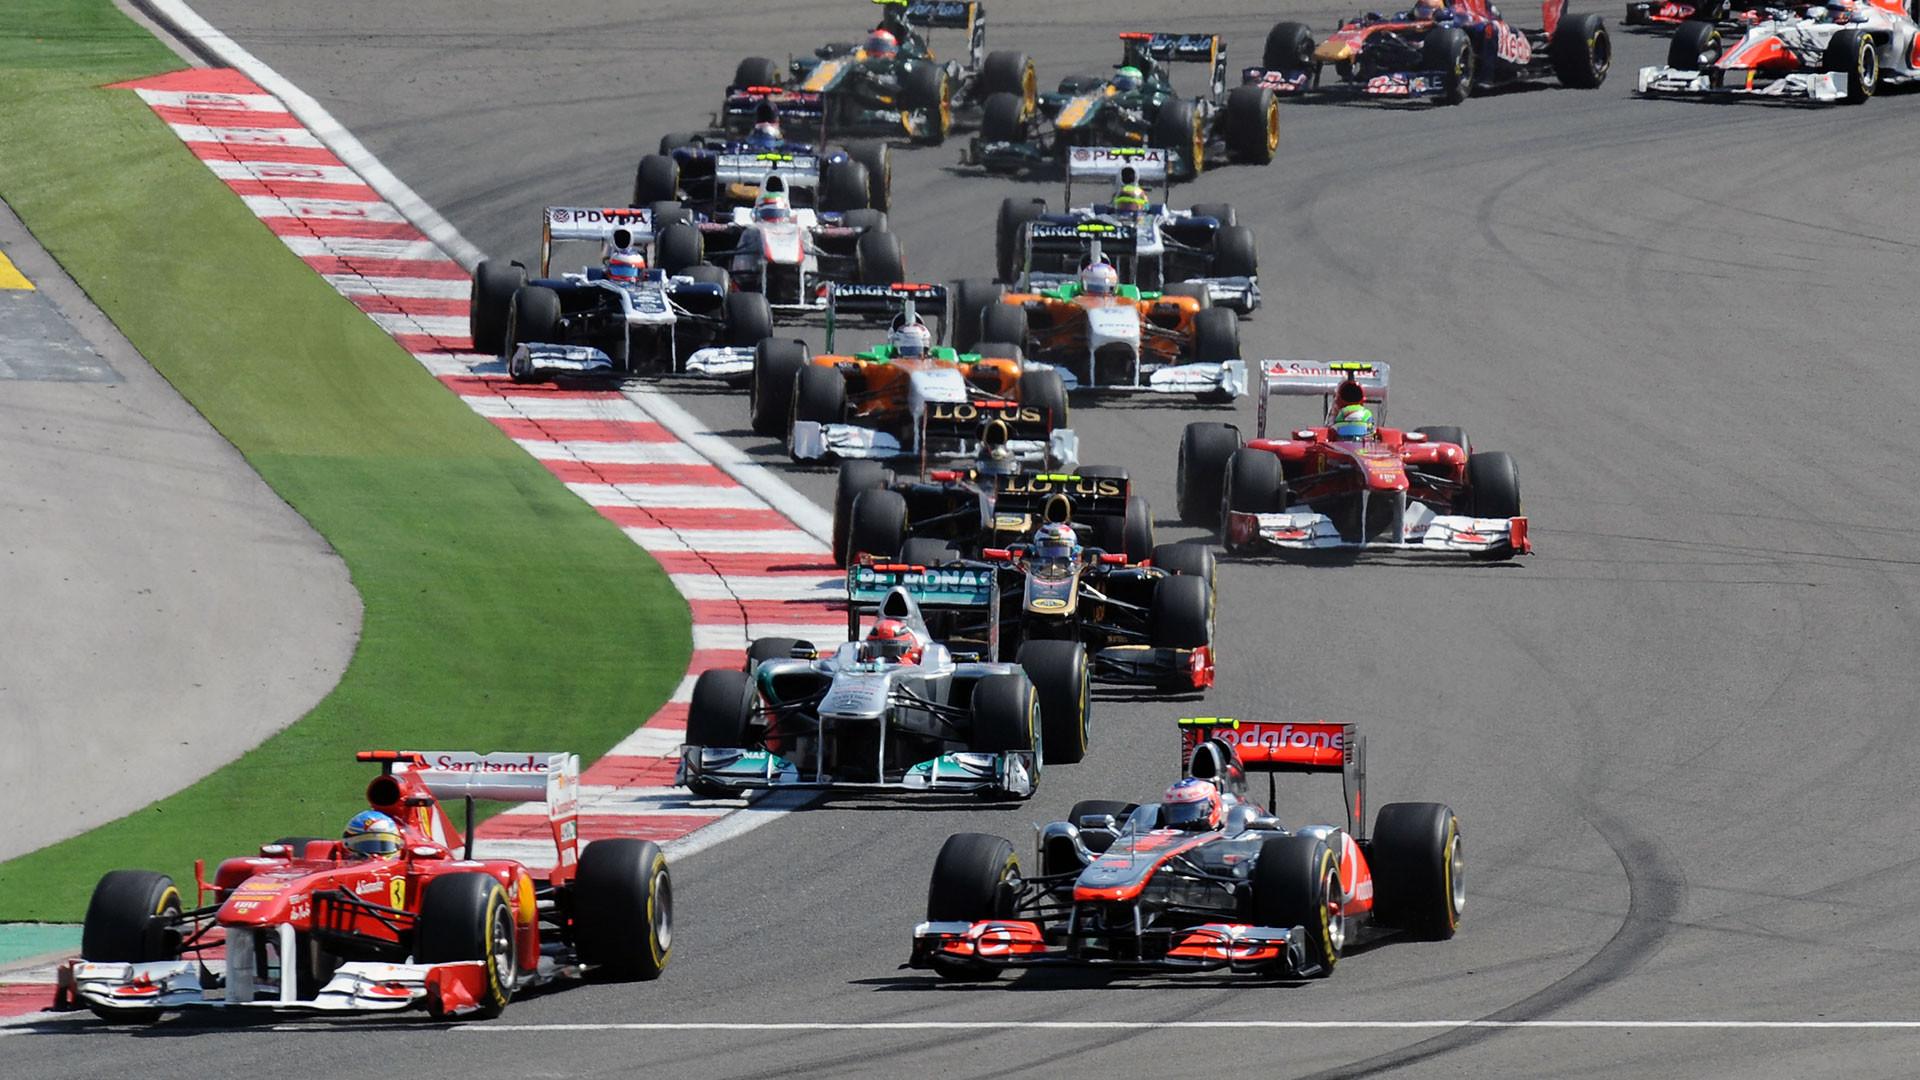 First corner after start several F1 cars …